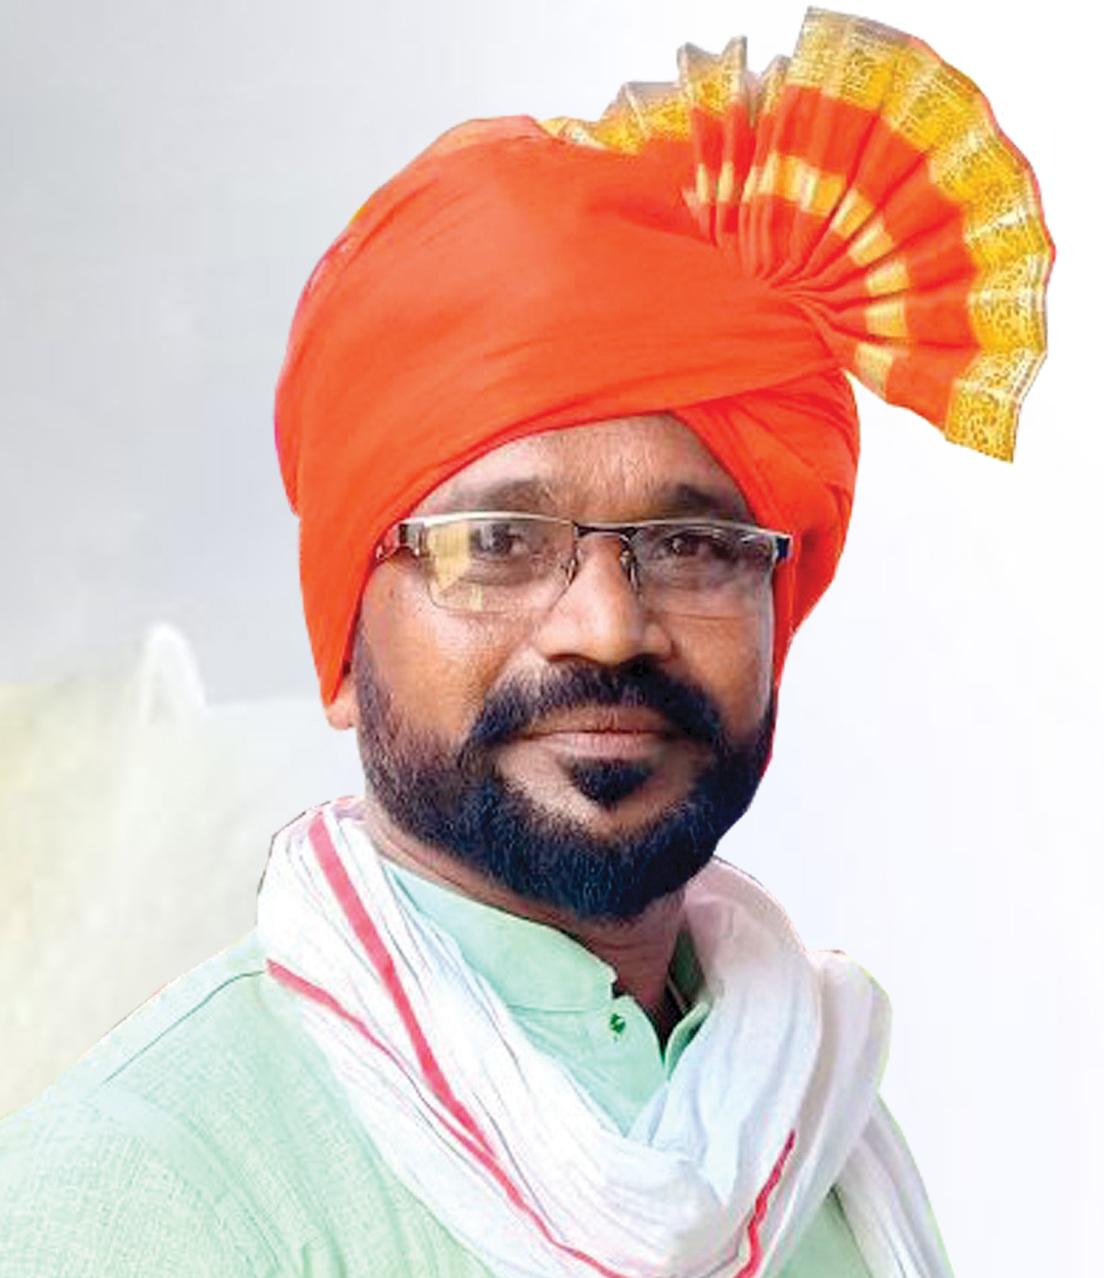 Rajesh Pahapale